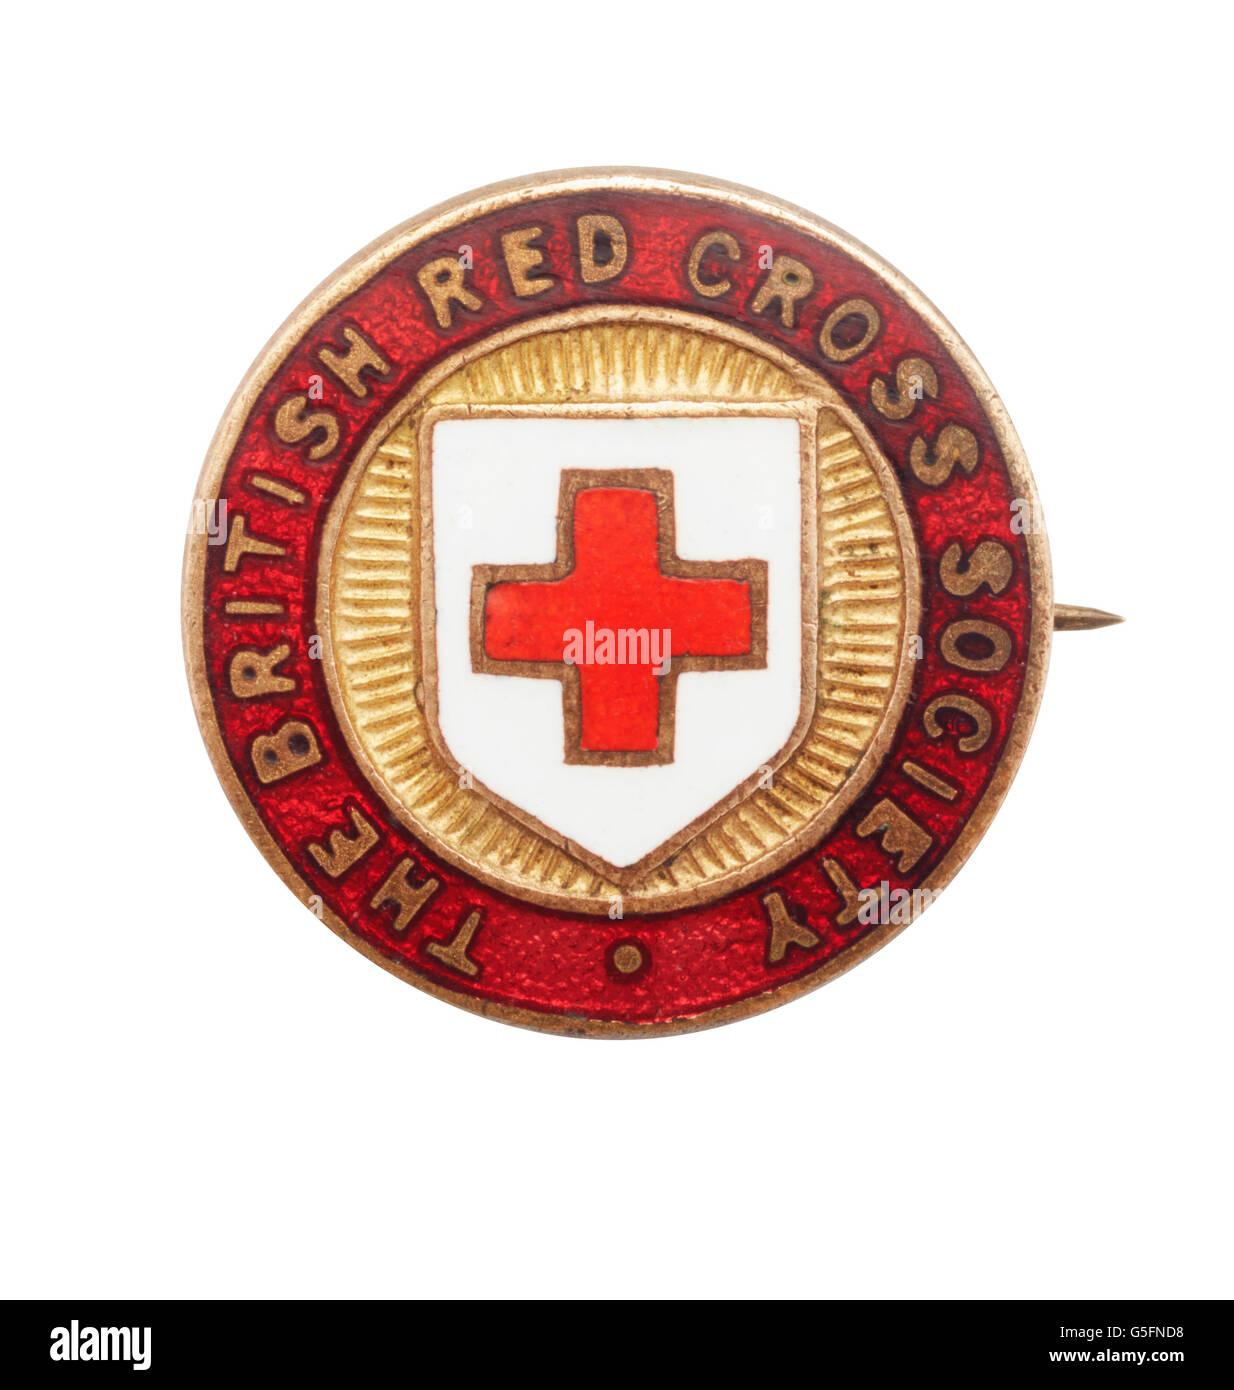 British Red Cross Society Stock Photos British Red Cross Society